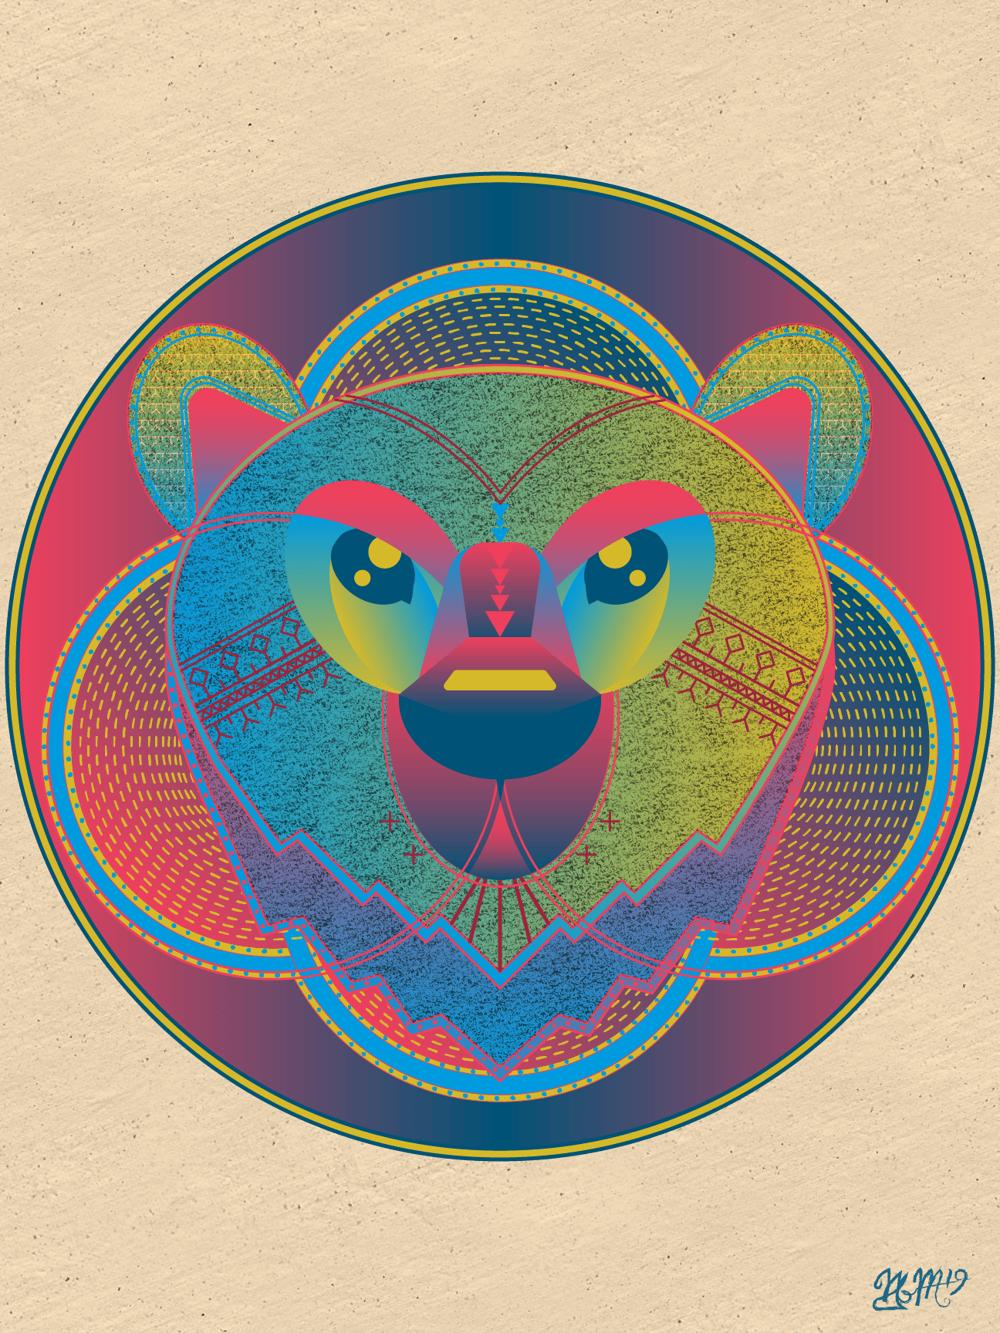 Polar Bear - image 10 - student project